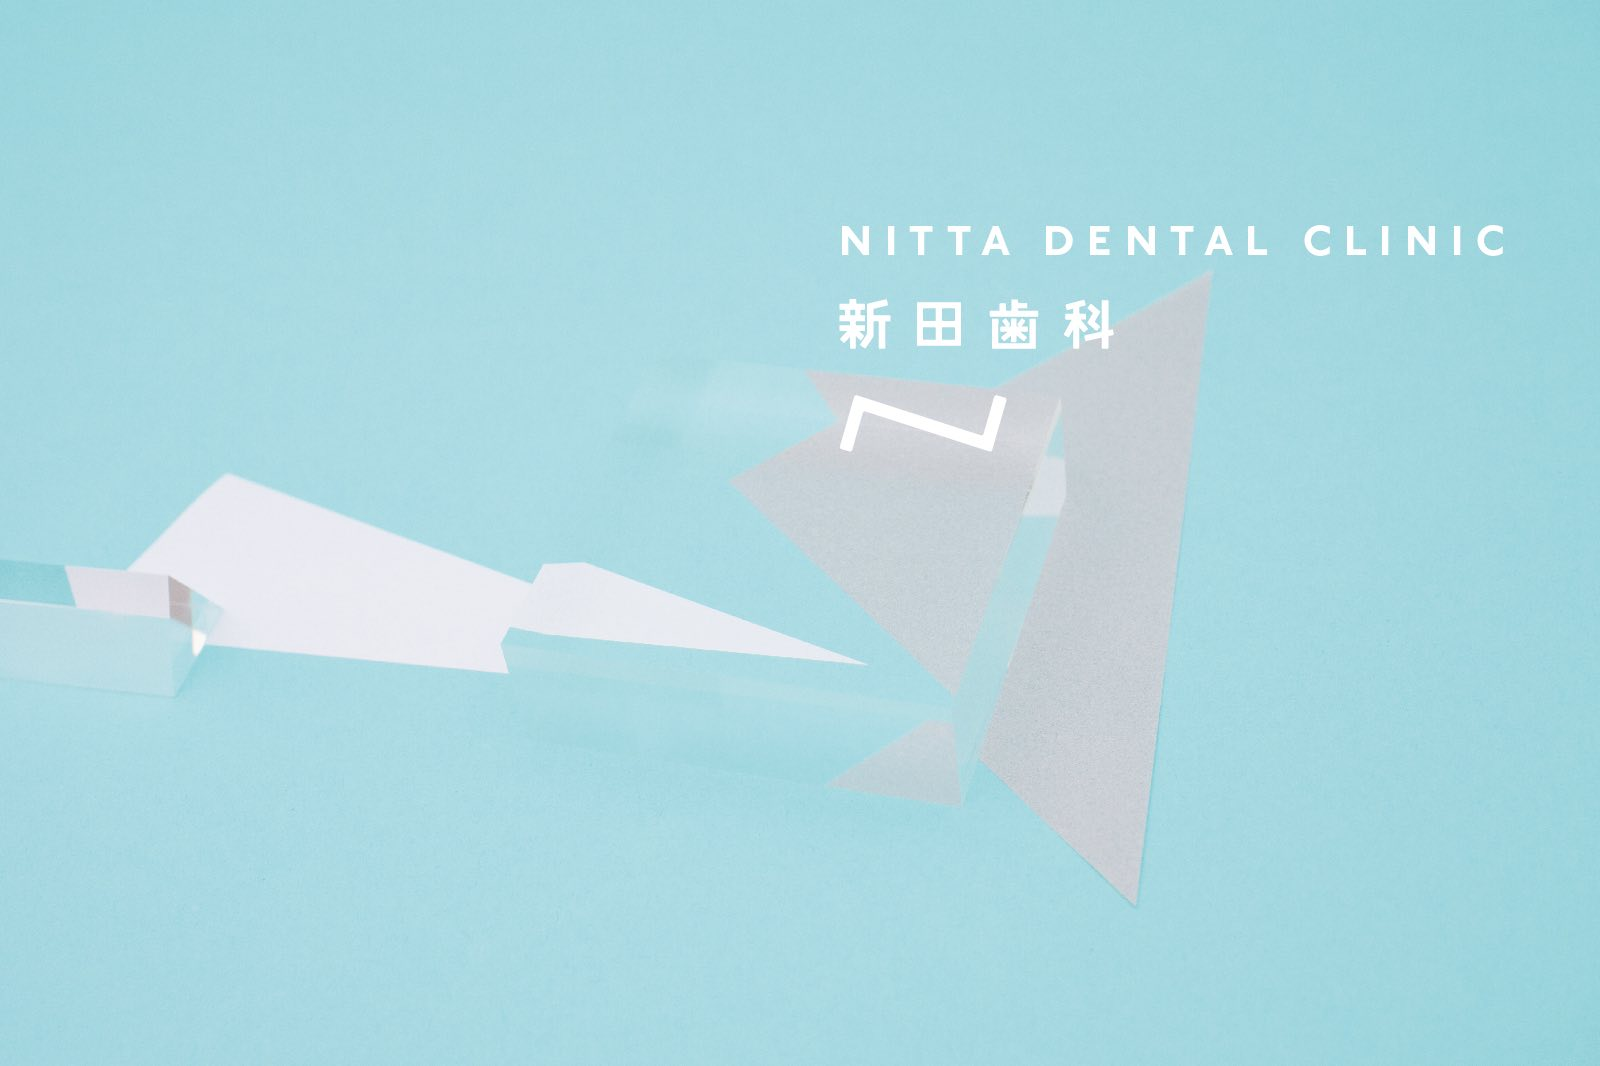 nitta dental clinic